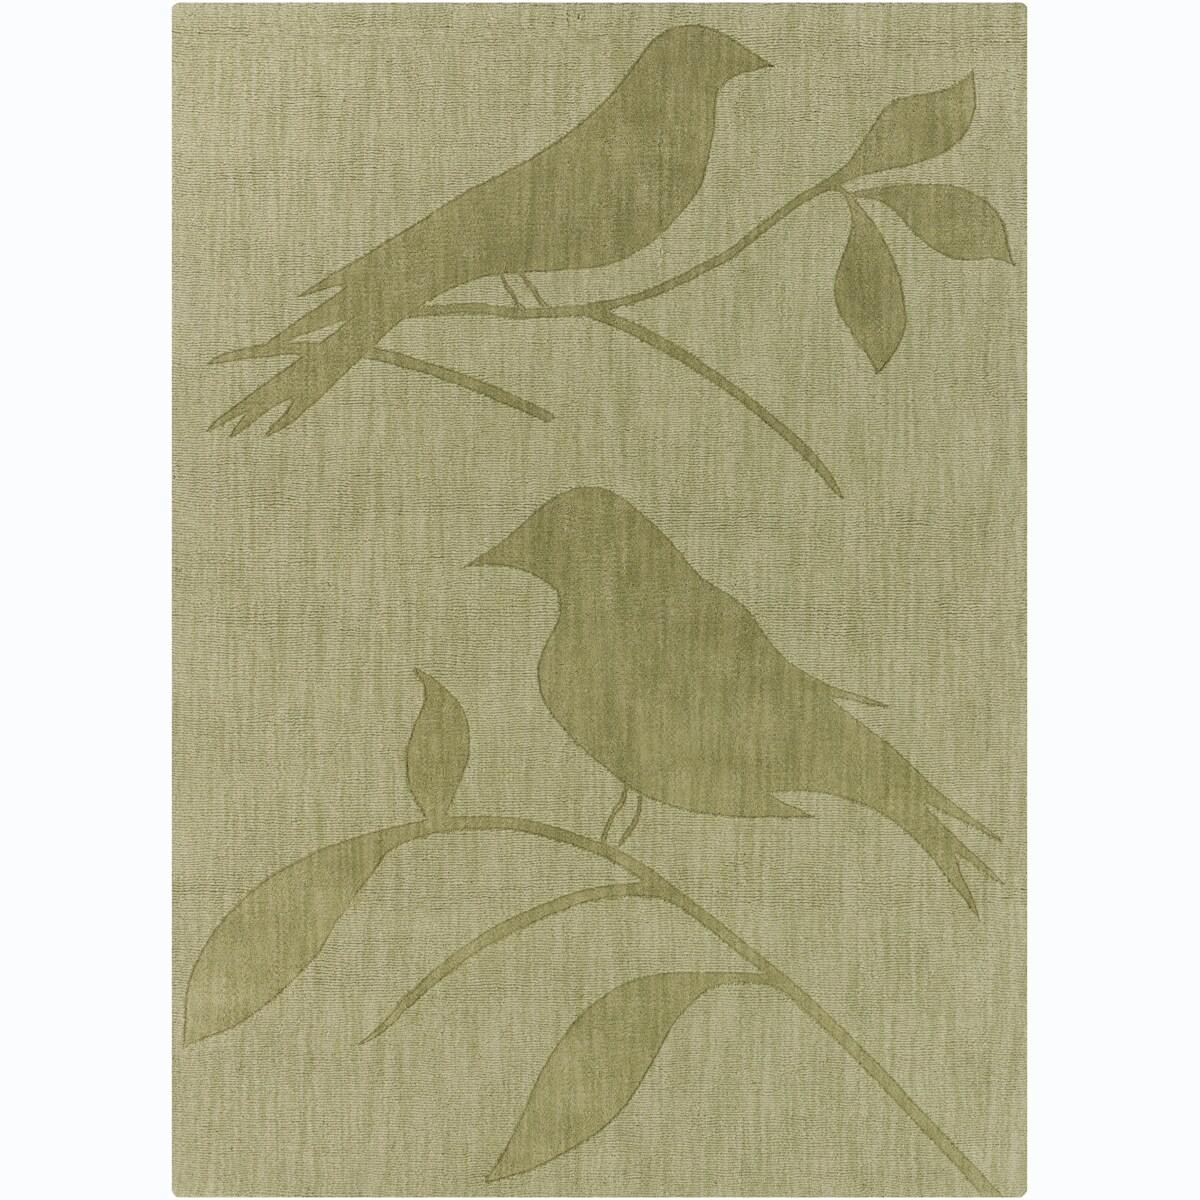 Artist's Loom Hand-tufted Transitional Animal Print Wool Rug - 7' x 10'